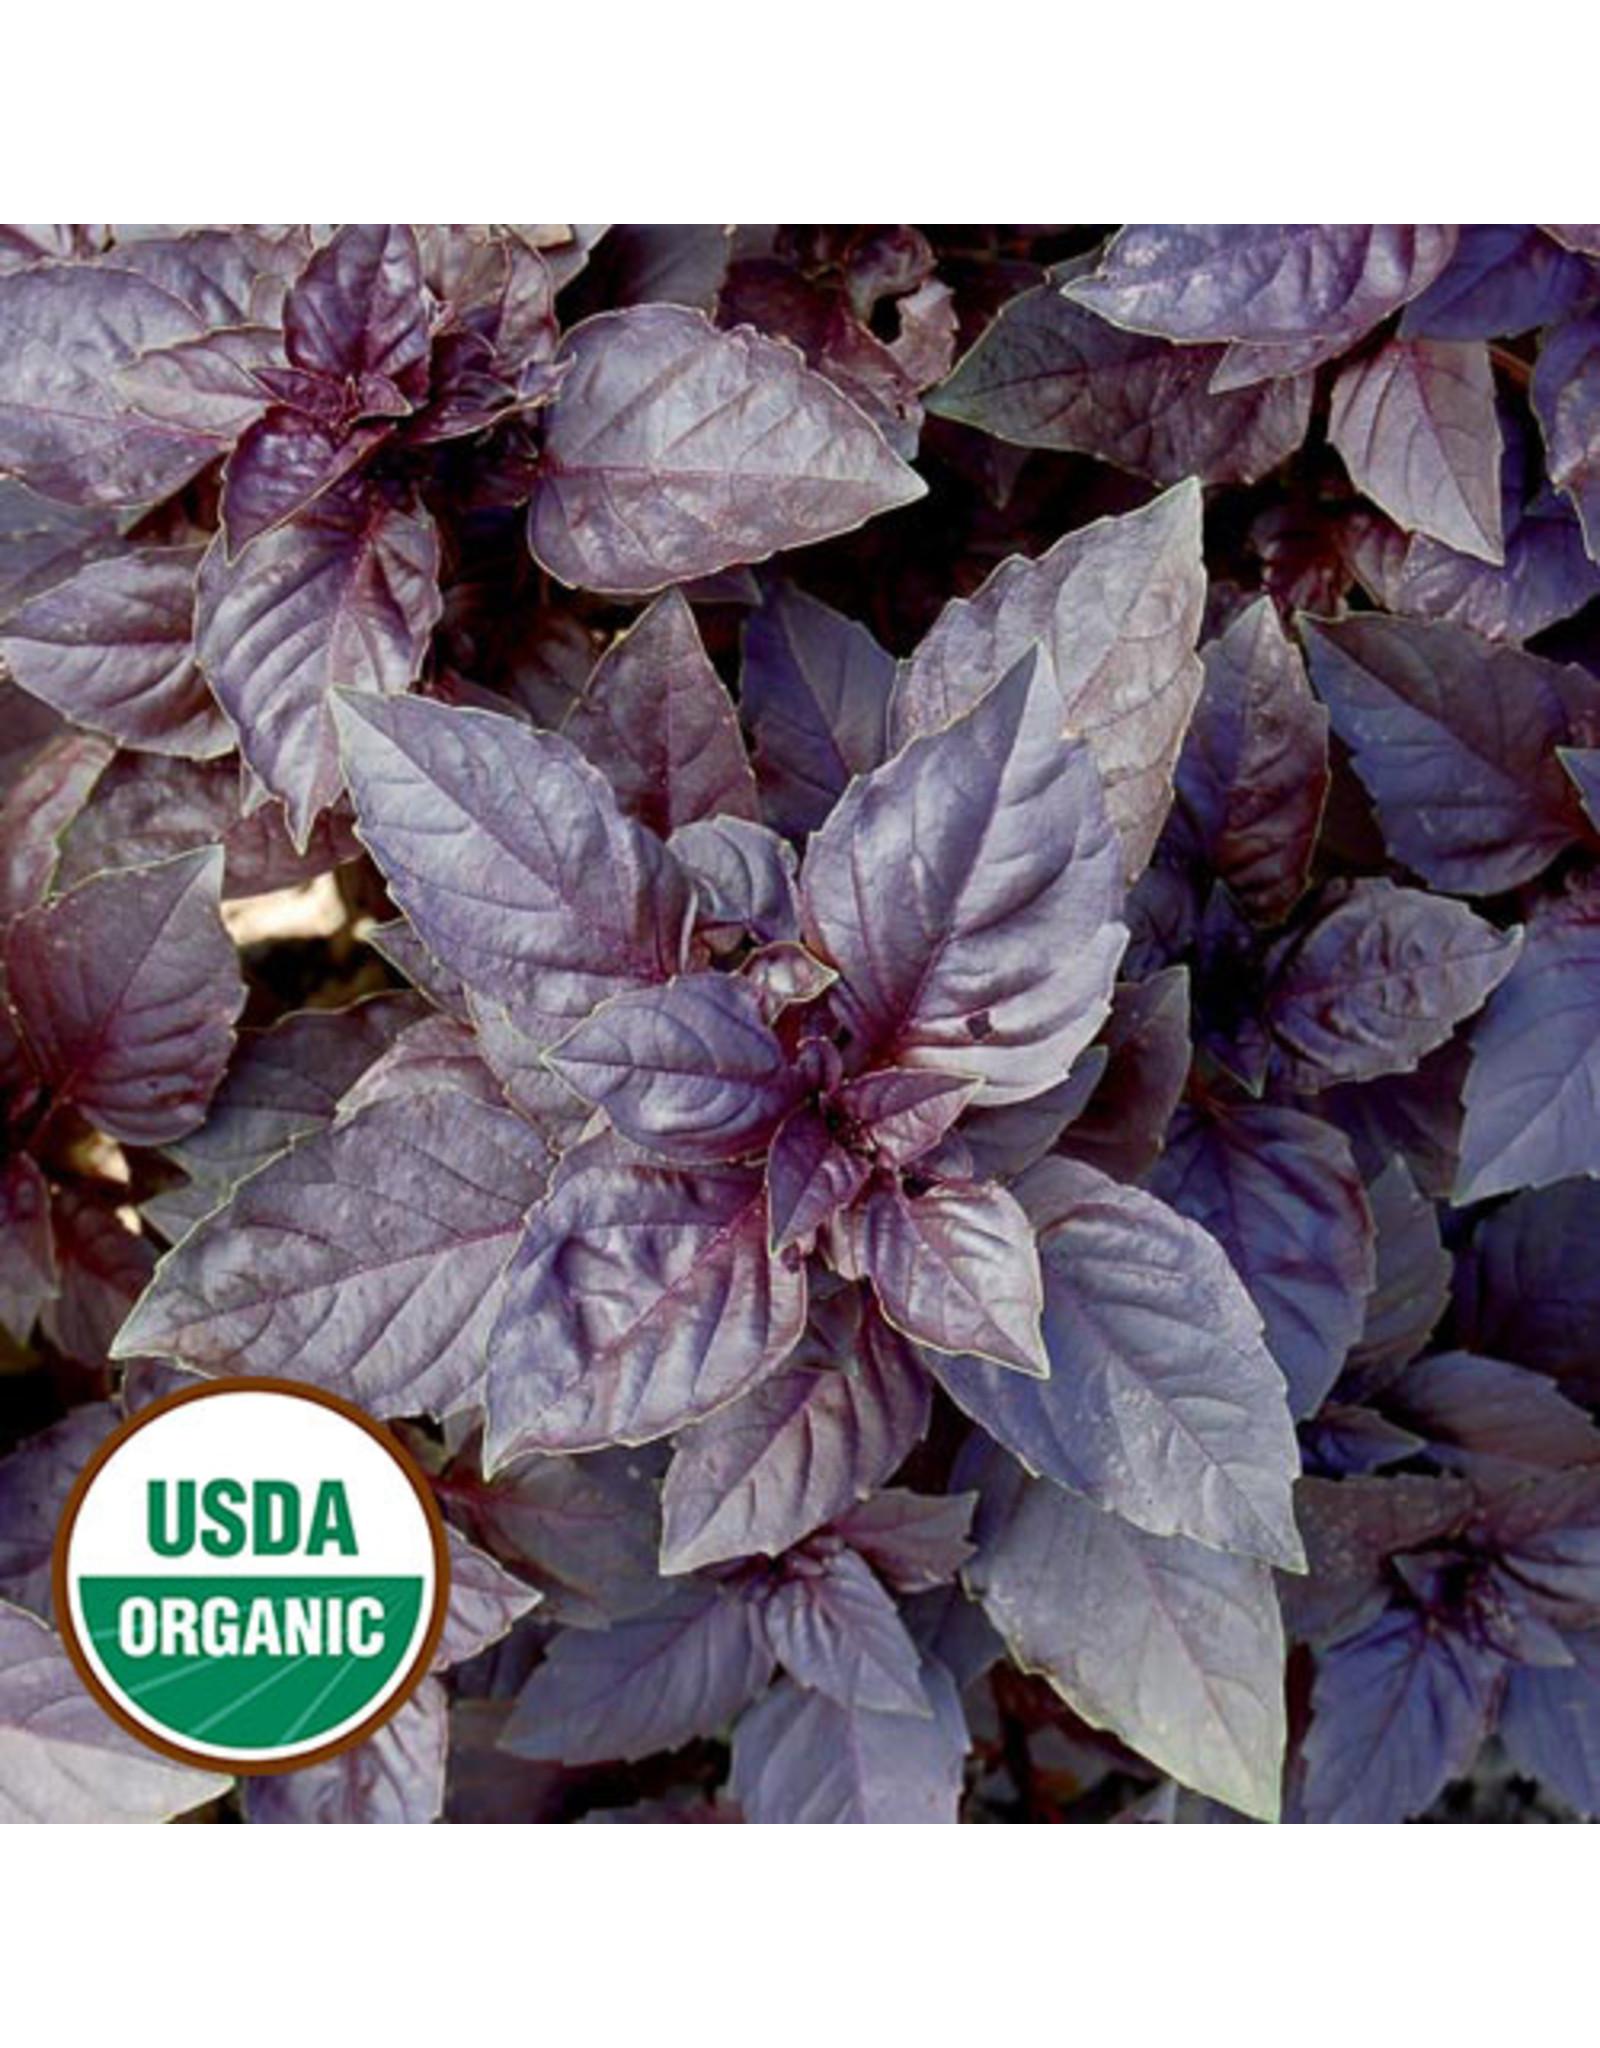 Seed Savers Herb - Dark Opal Basil